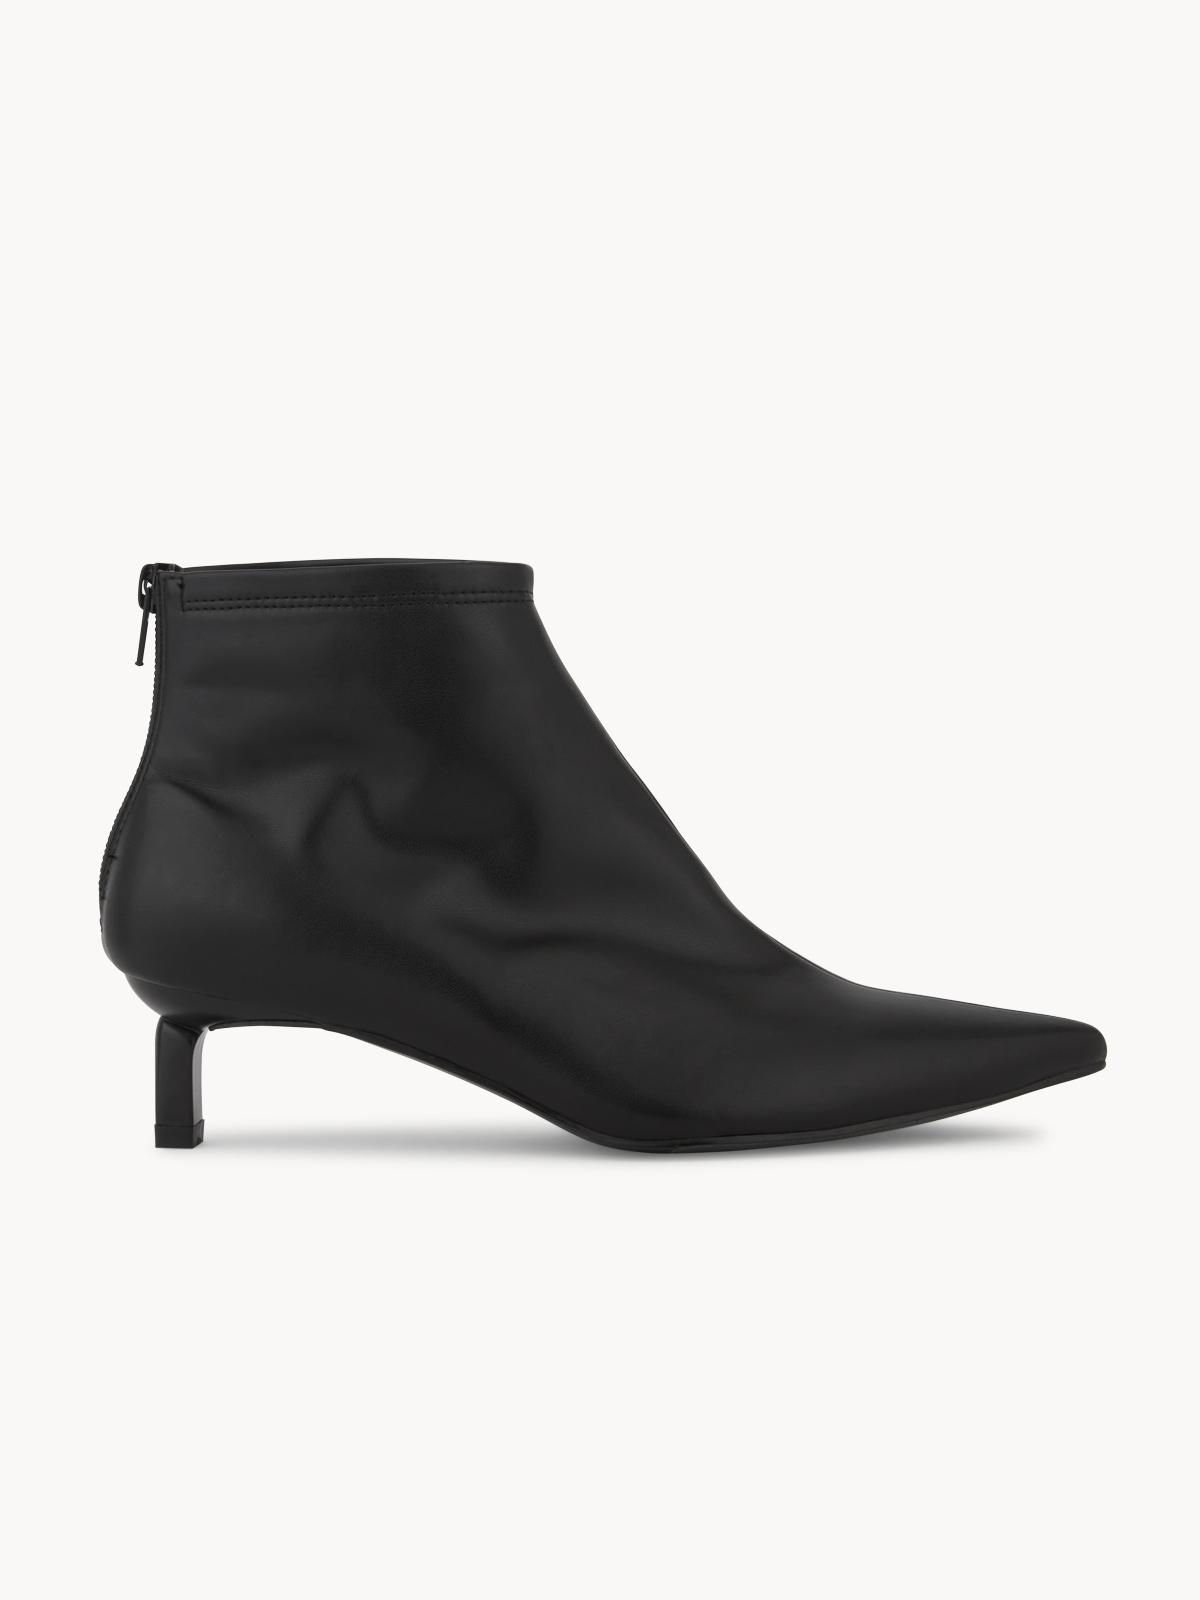 Starkela Heeled Ankle Boots Black